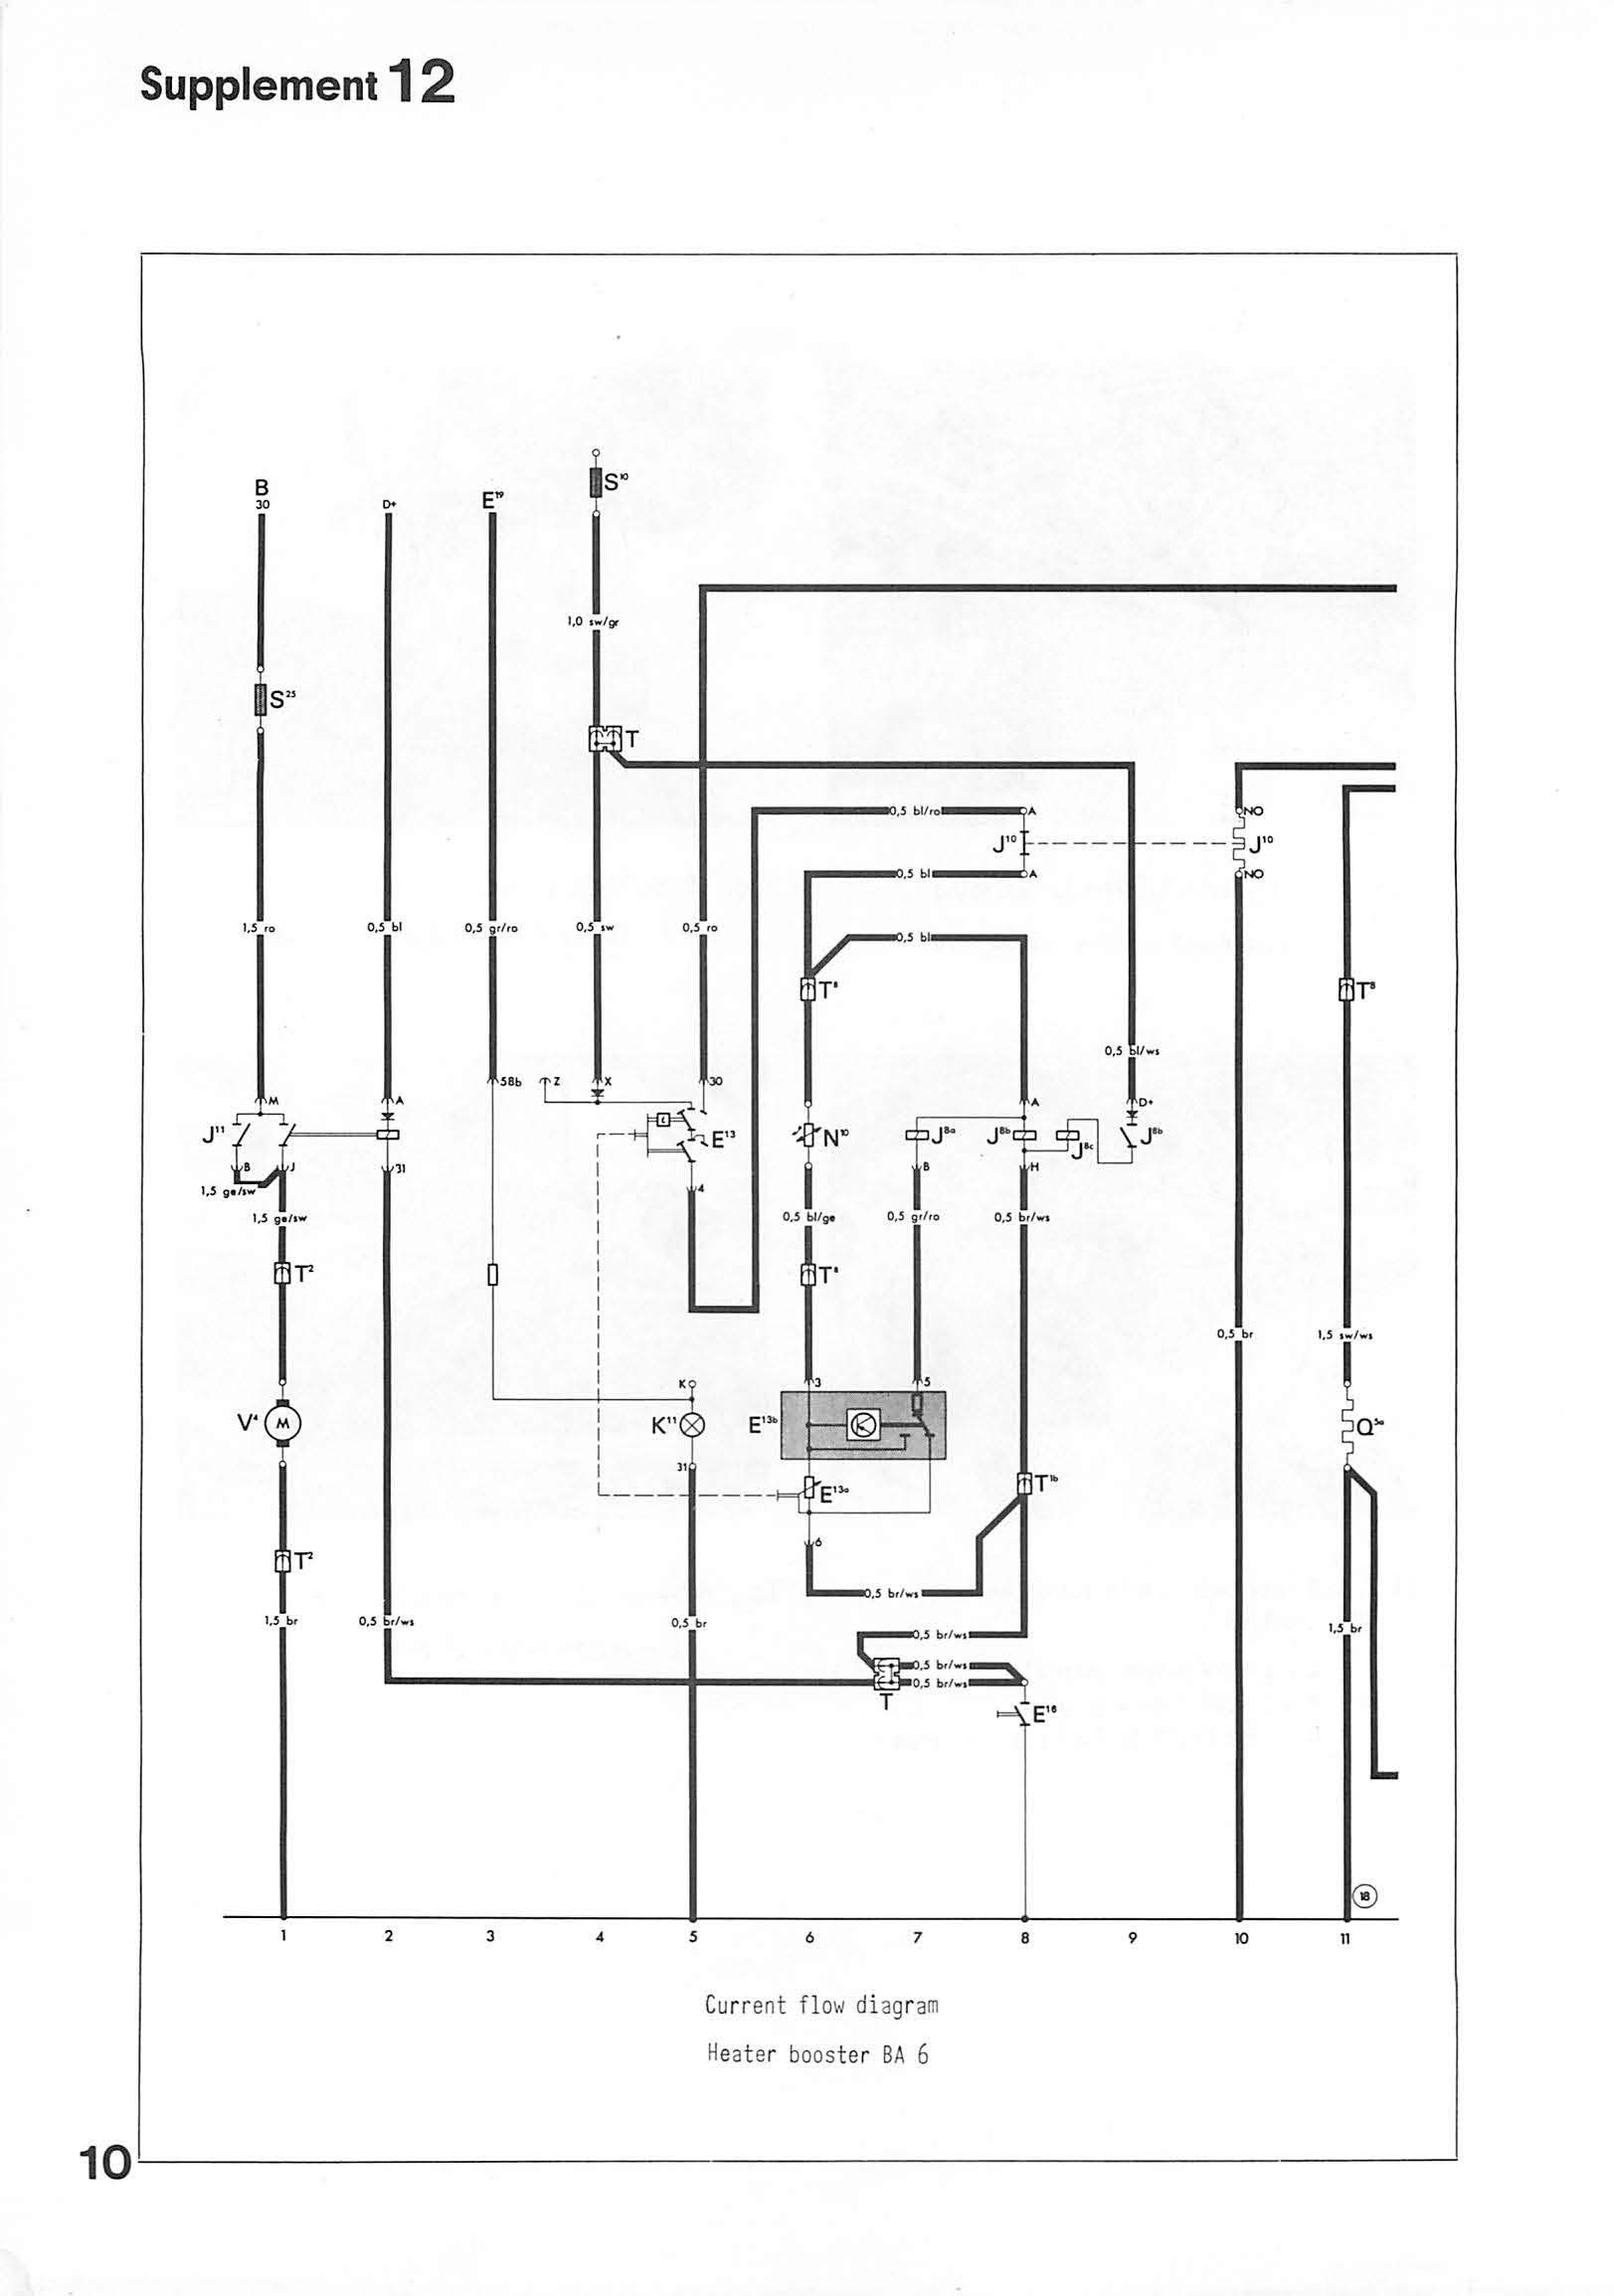 1977 volkswagen bus wiring diagram volkswagen bus wiring diagram thesamba com bay window bus view topic help with #4